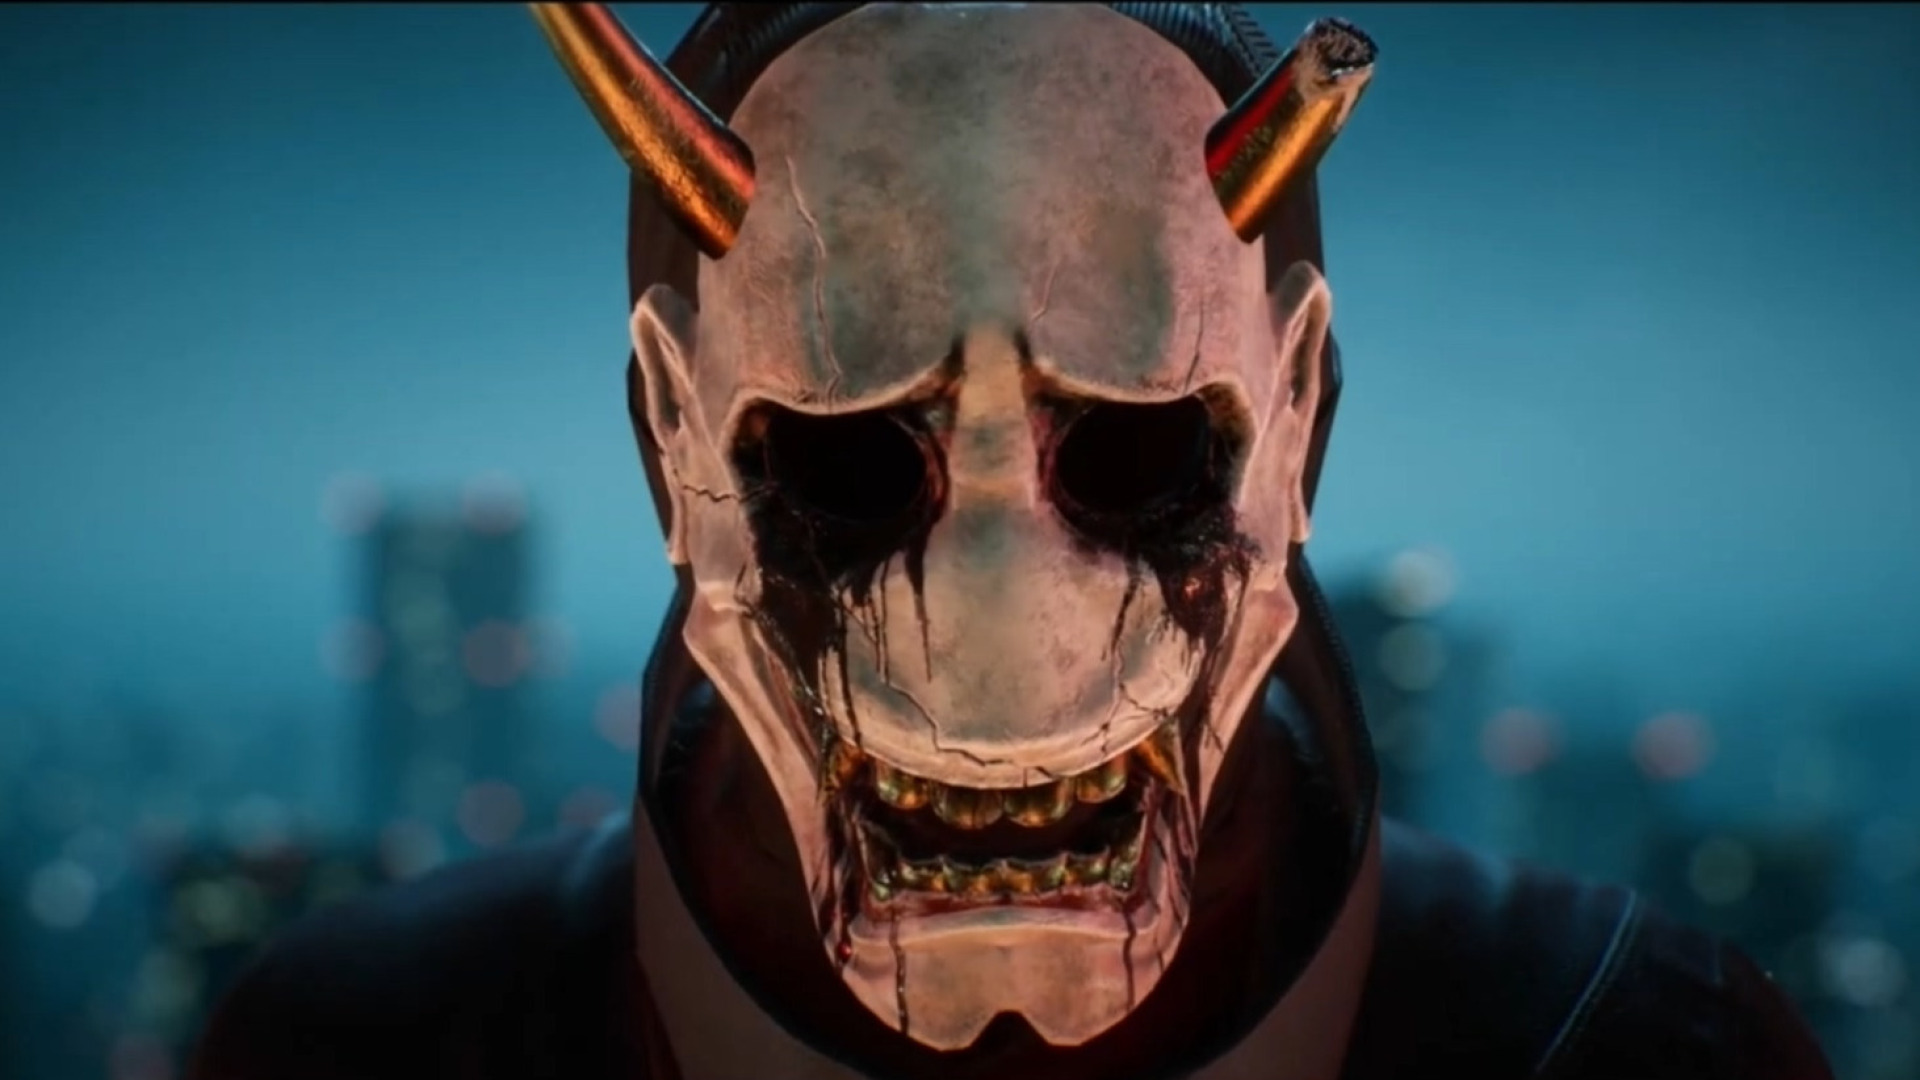 Trailer, Bethesda, Adventure, Horror, Bethesda Softworks, PlayStation Showcase 2021, GhostWire: Tokyo, GhostWire